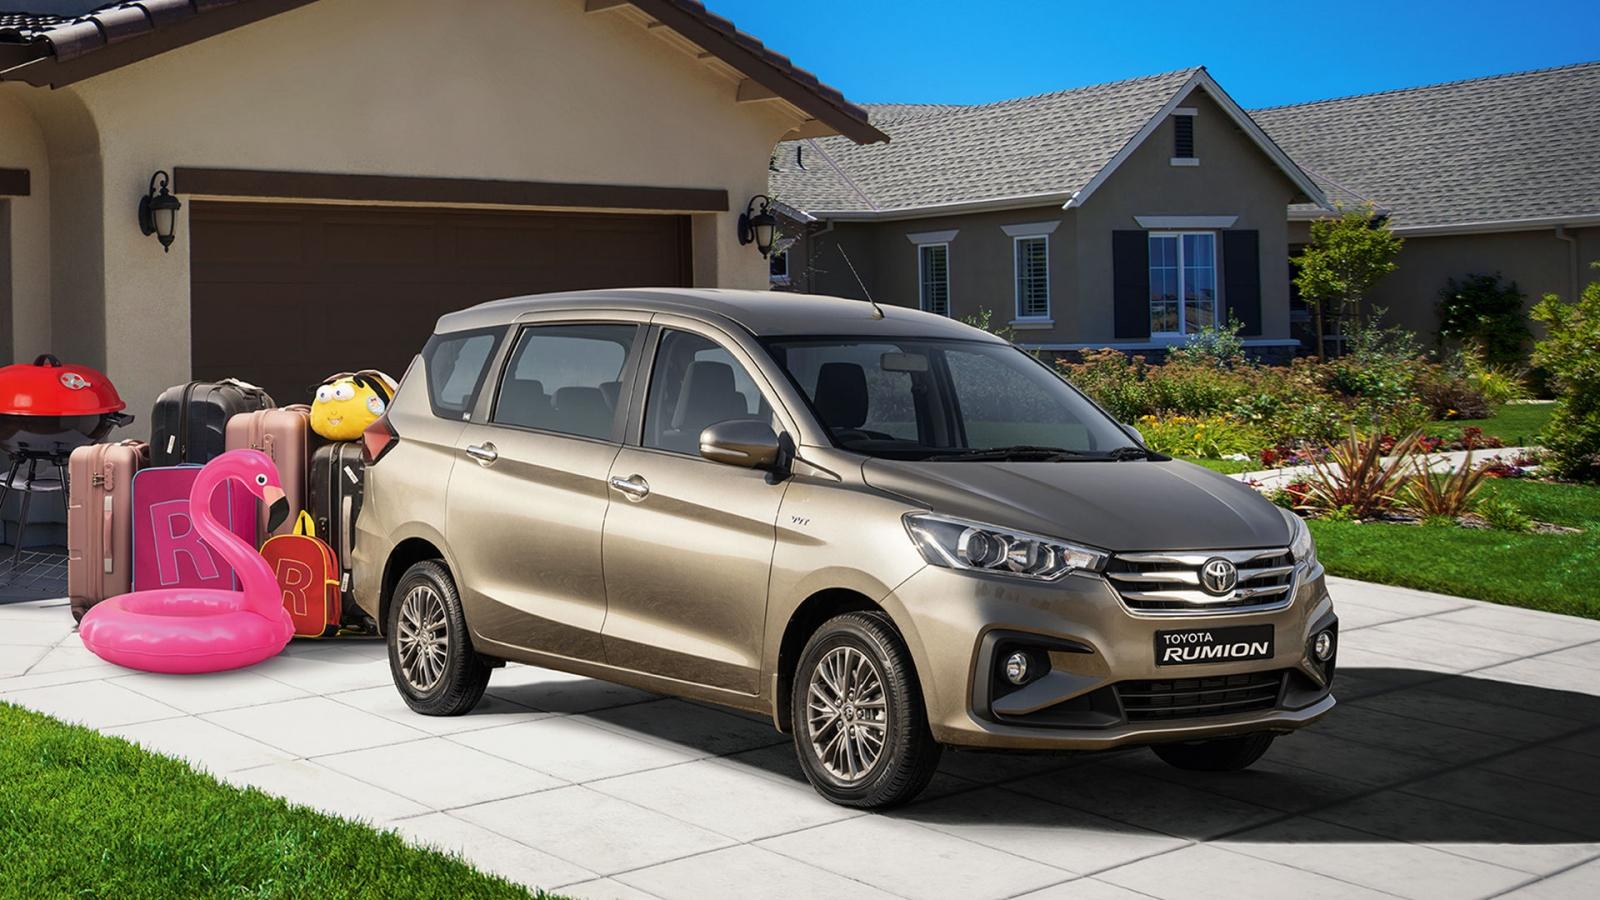 MPV mới của Toyota giống hệt Suzuki Ertiga